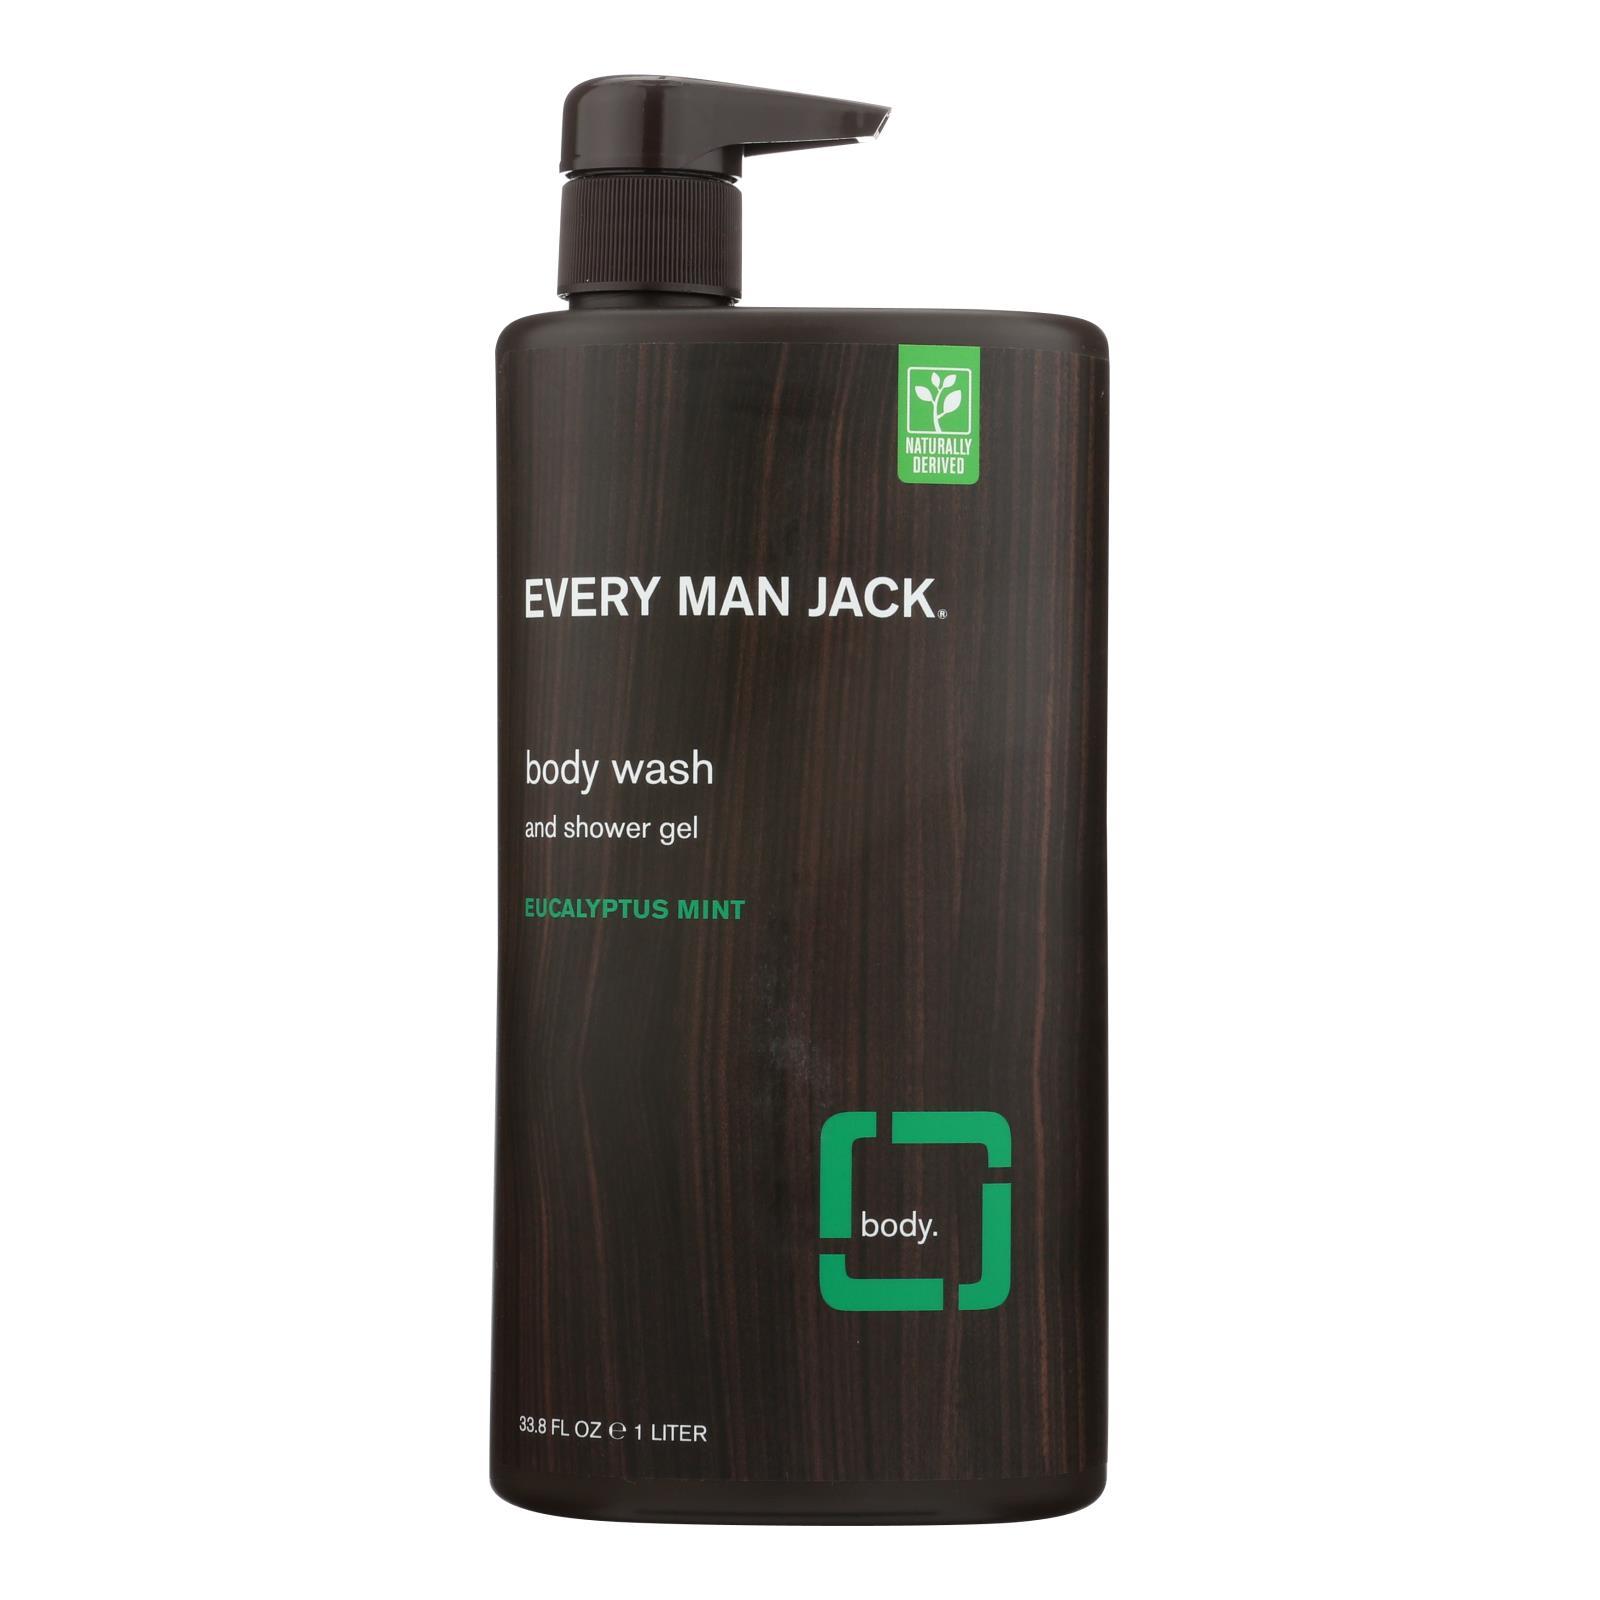 Every Man Jack Body Wash Eucalyptus Mint Body Wash - Case of 33.8 - 33.8 fl oz.